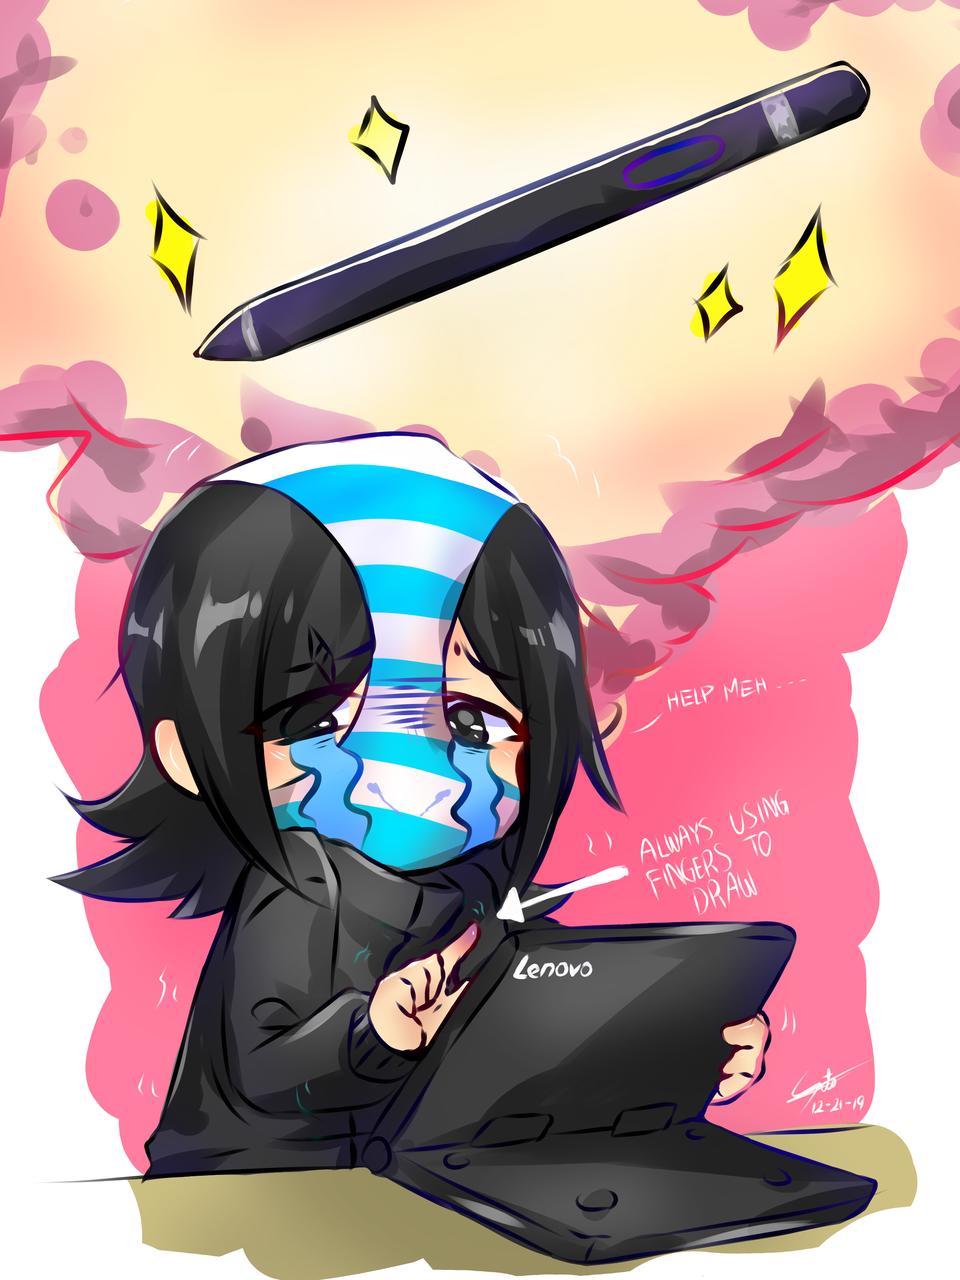 ngkkk! Illust of Ecchiban-Sensei giftyouwant